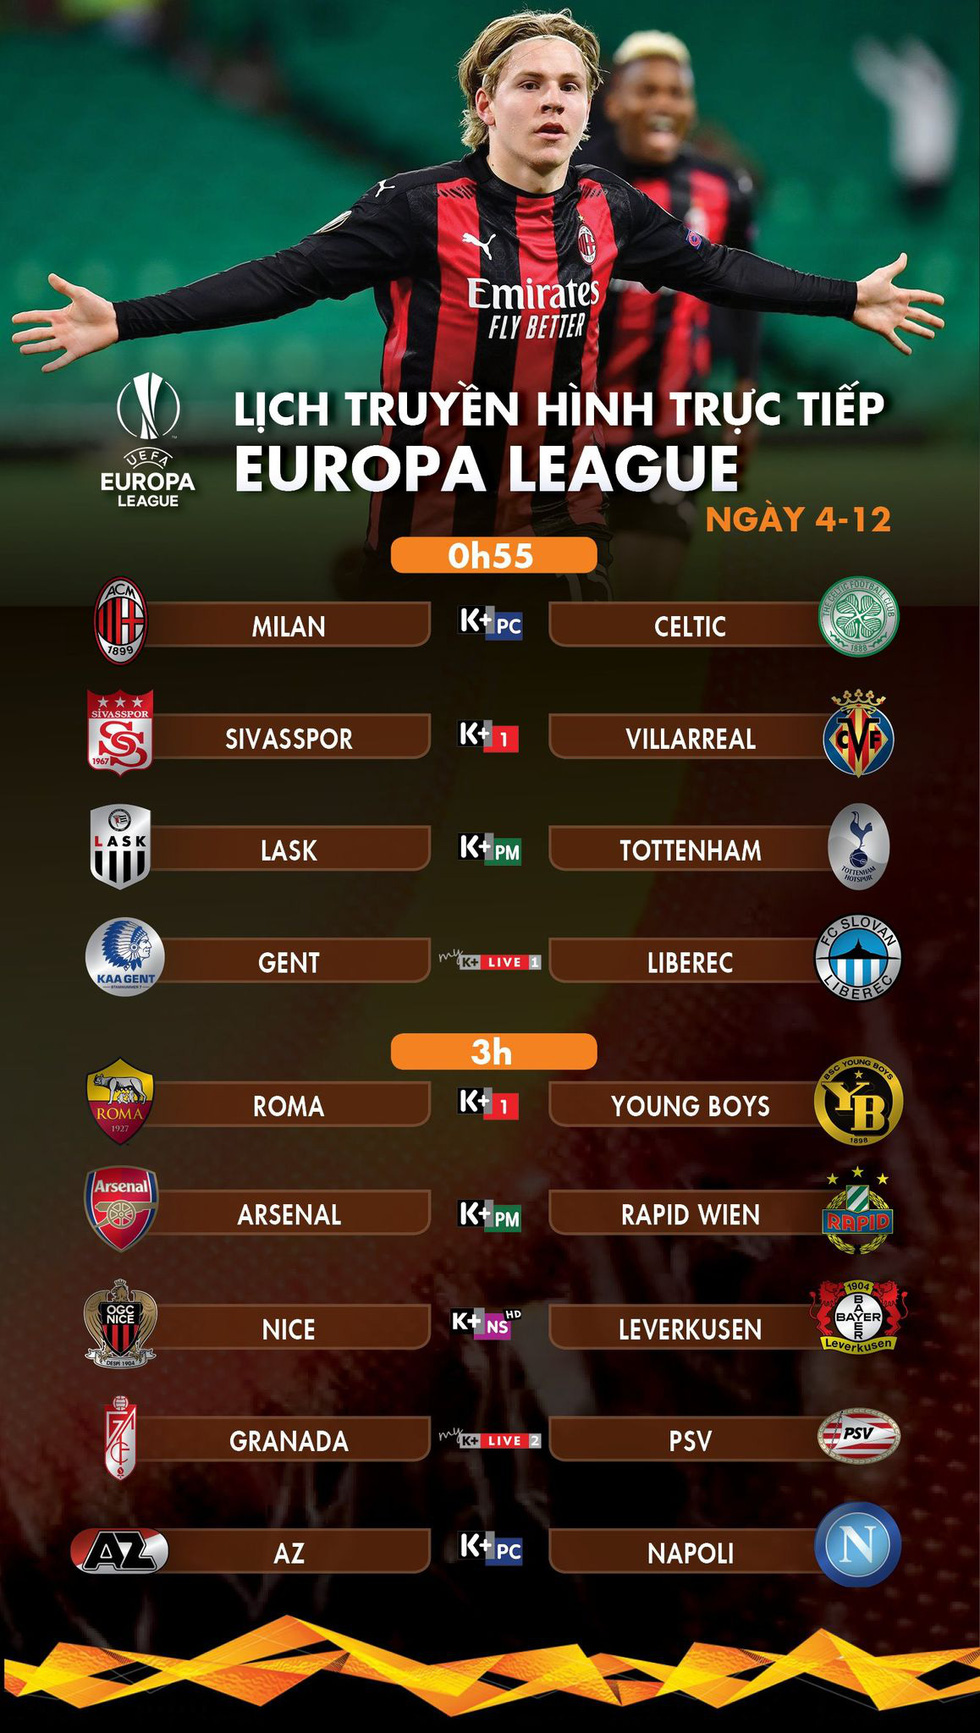 Lịch trực tiếp Europa League 4-12: Chờ Tottenham đi tiếp - Ảnh 1.